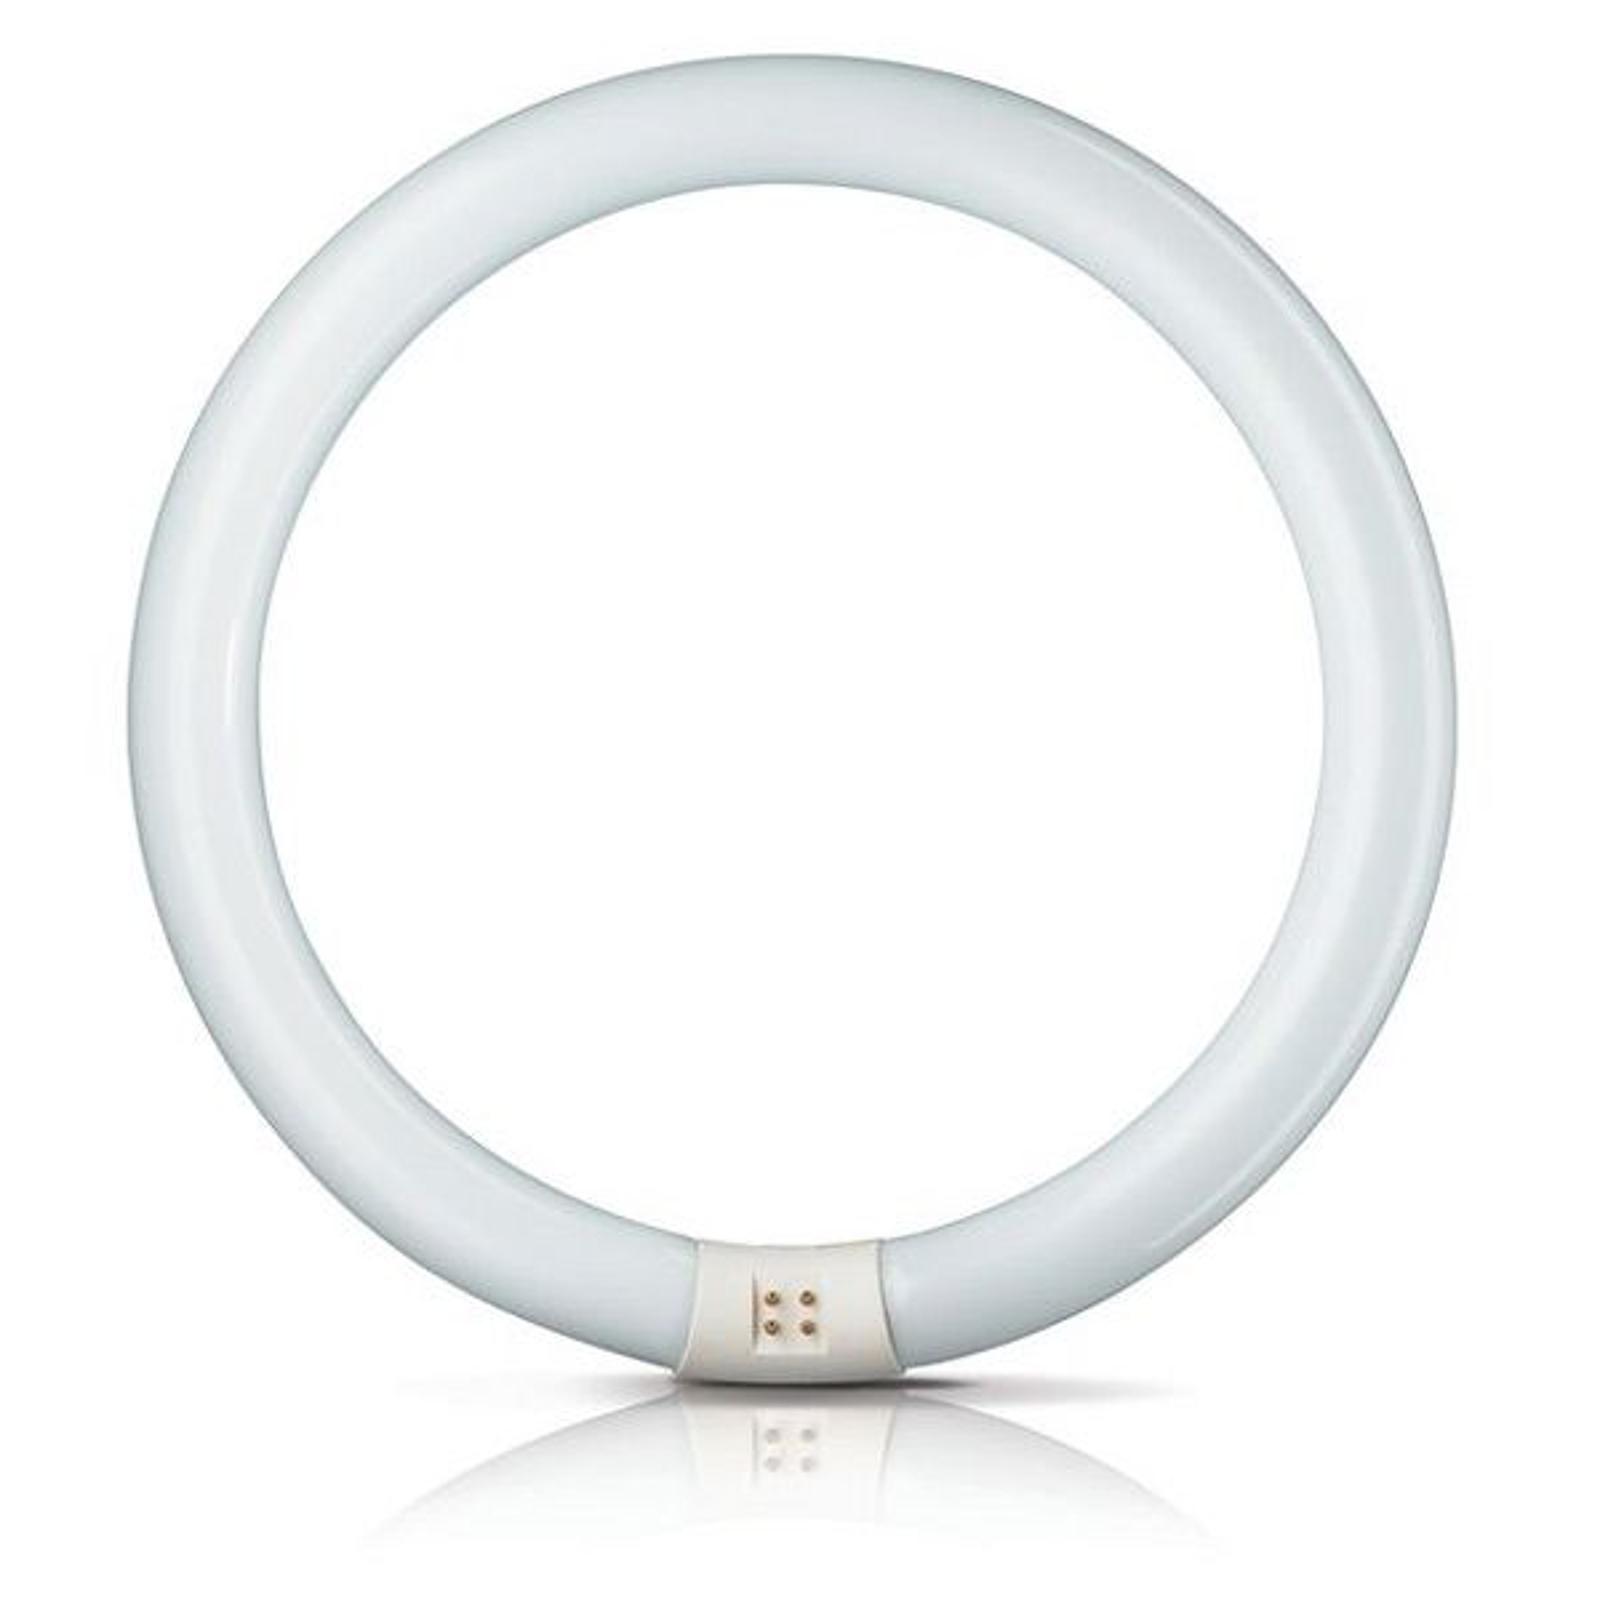 G10q 32W 865 lysstoffring Master Circular TL-E